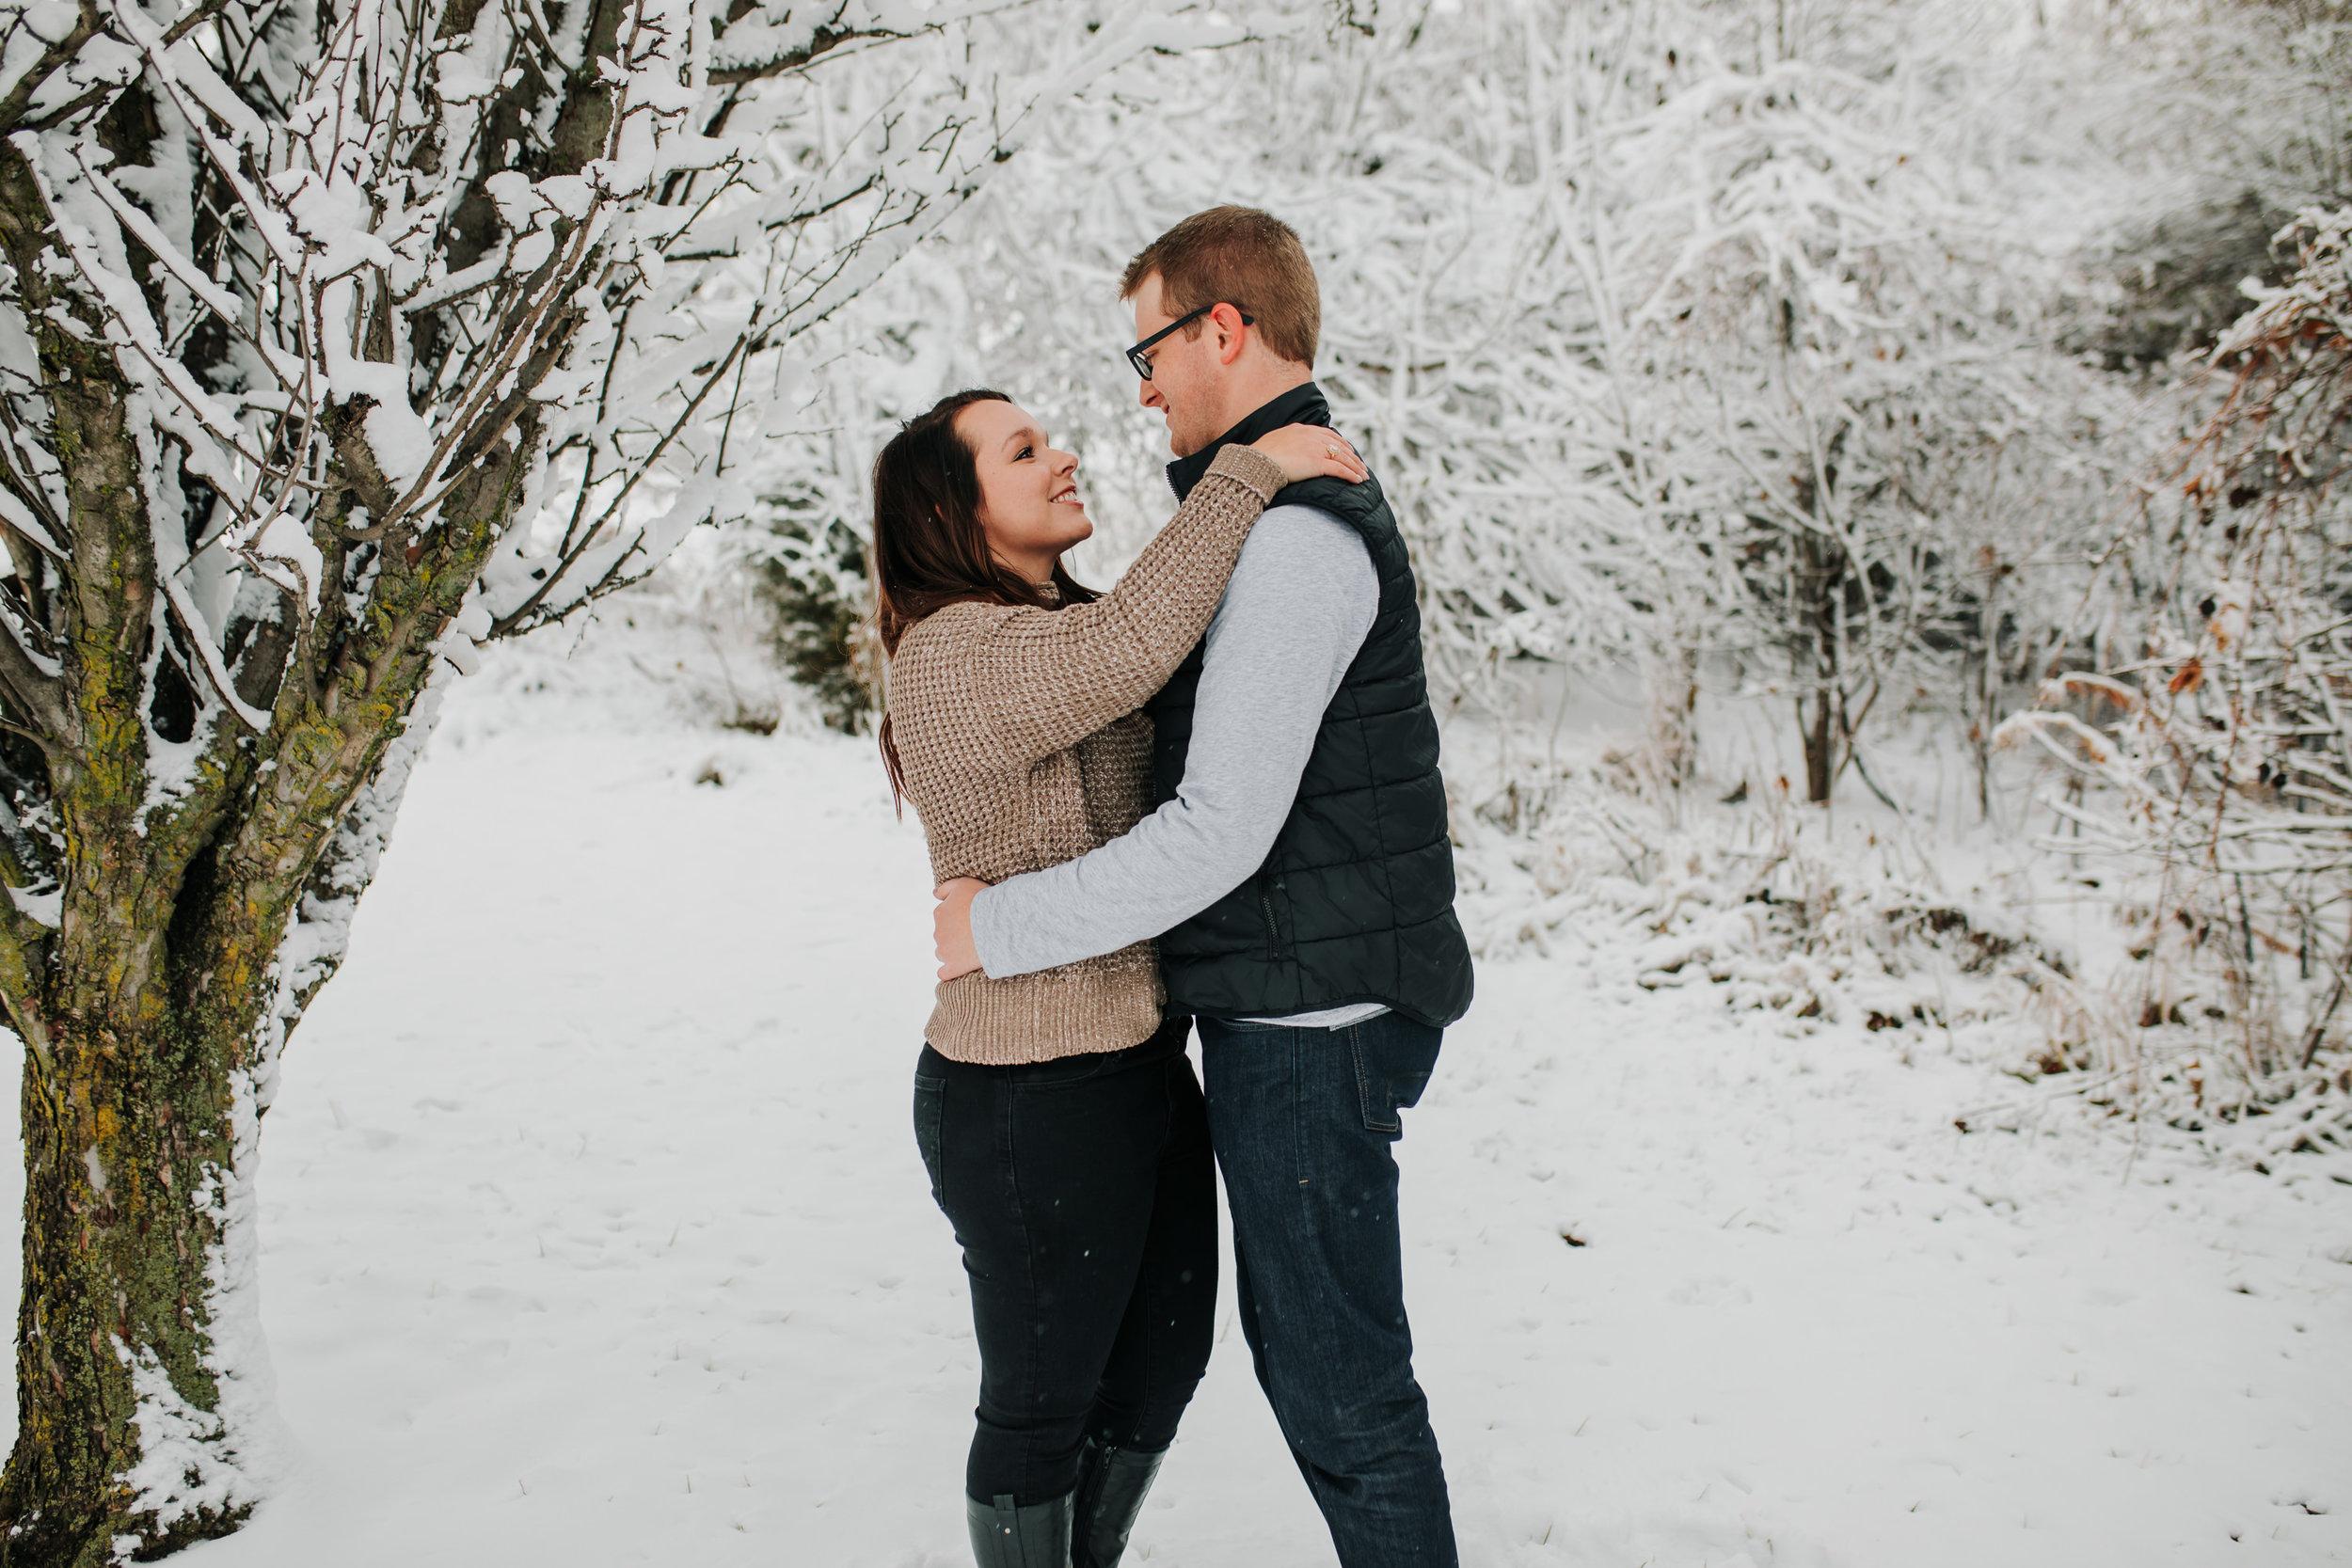 Vanessa & Dan - Engaged - Nathaniel Jensen Photography - Omaha Nebraska Wedding Photographer - Standing Bear Lake - Snowy Engagement Session-25.jpg